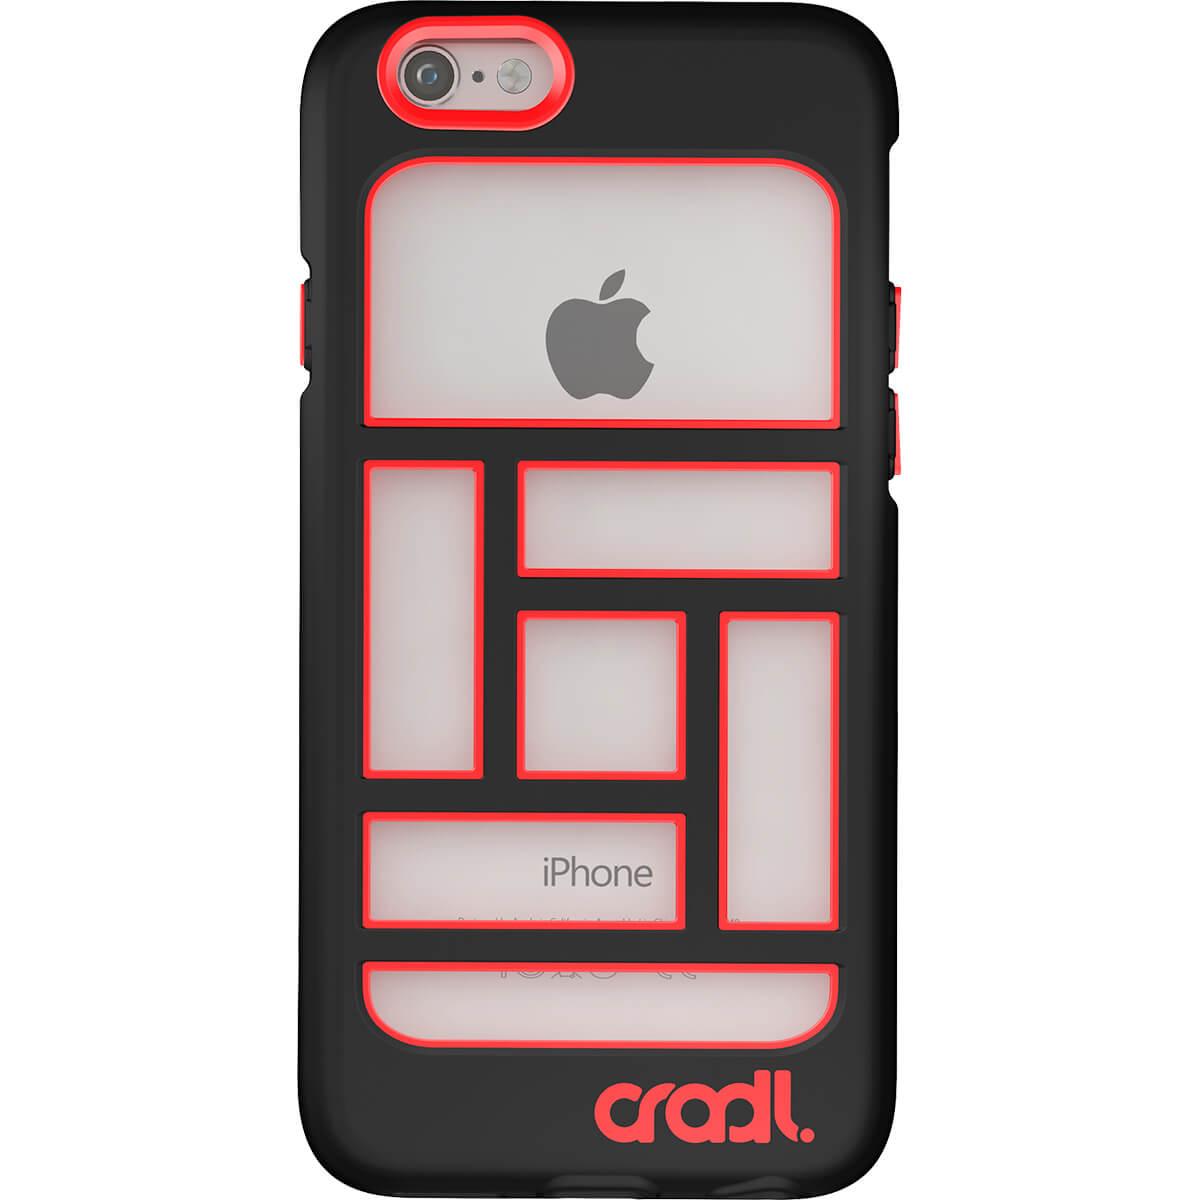 Blocks iPhone 6 case jet-crimson back (cropped)